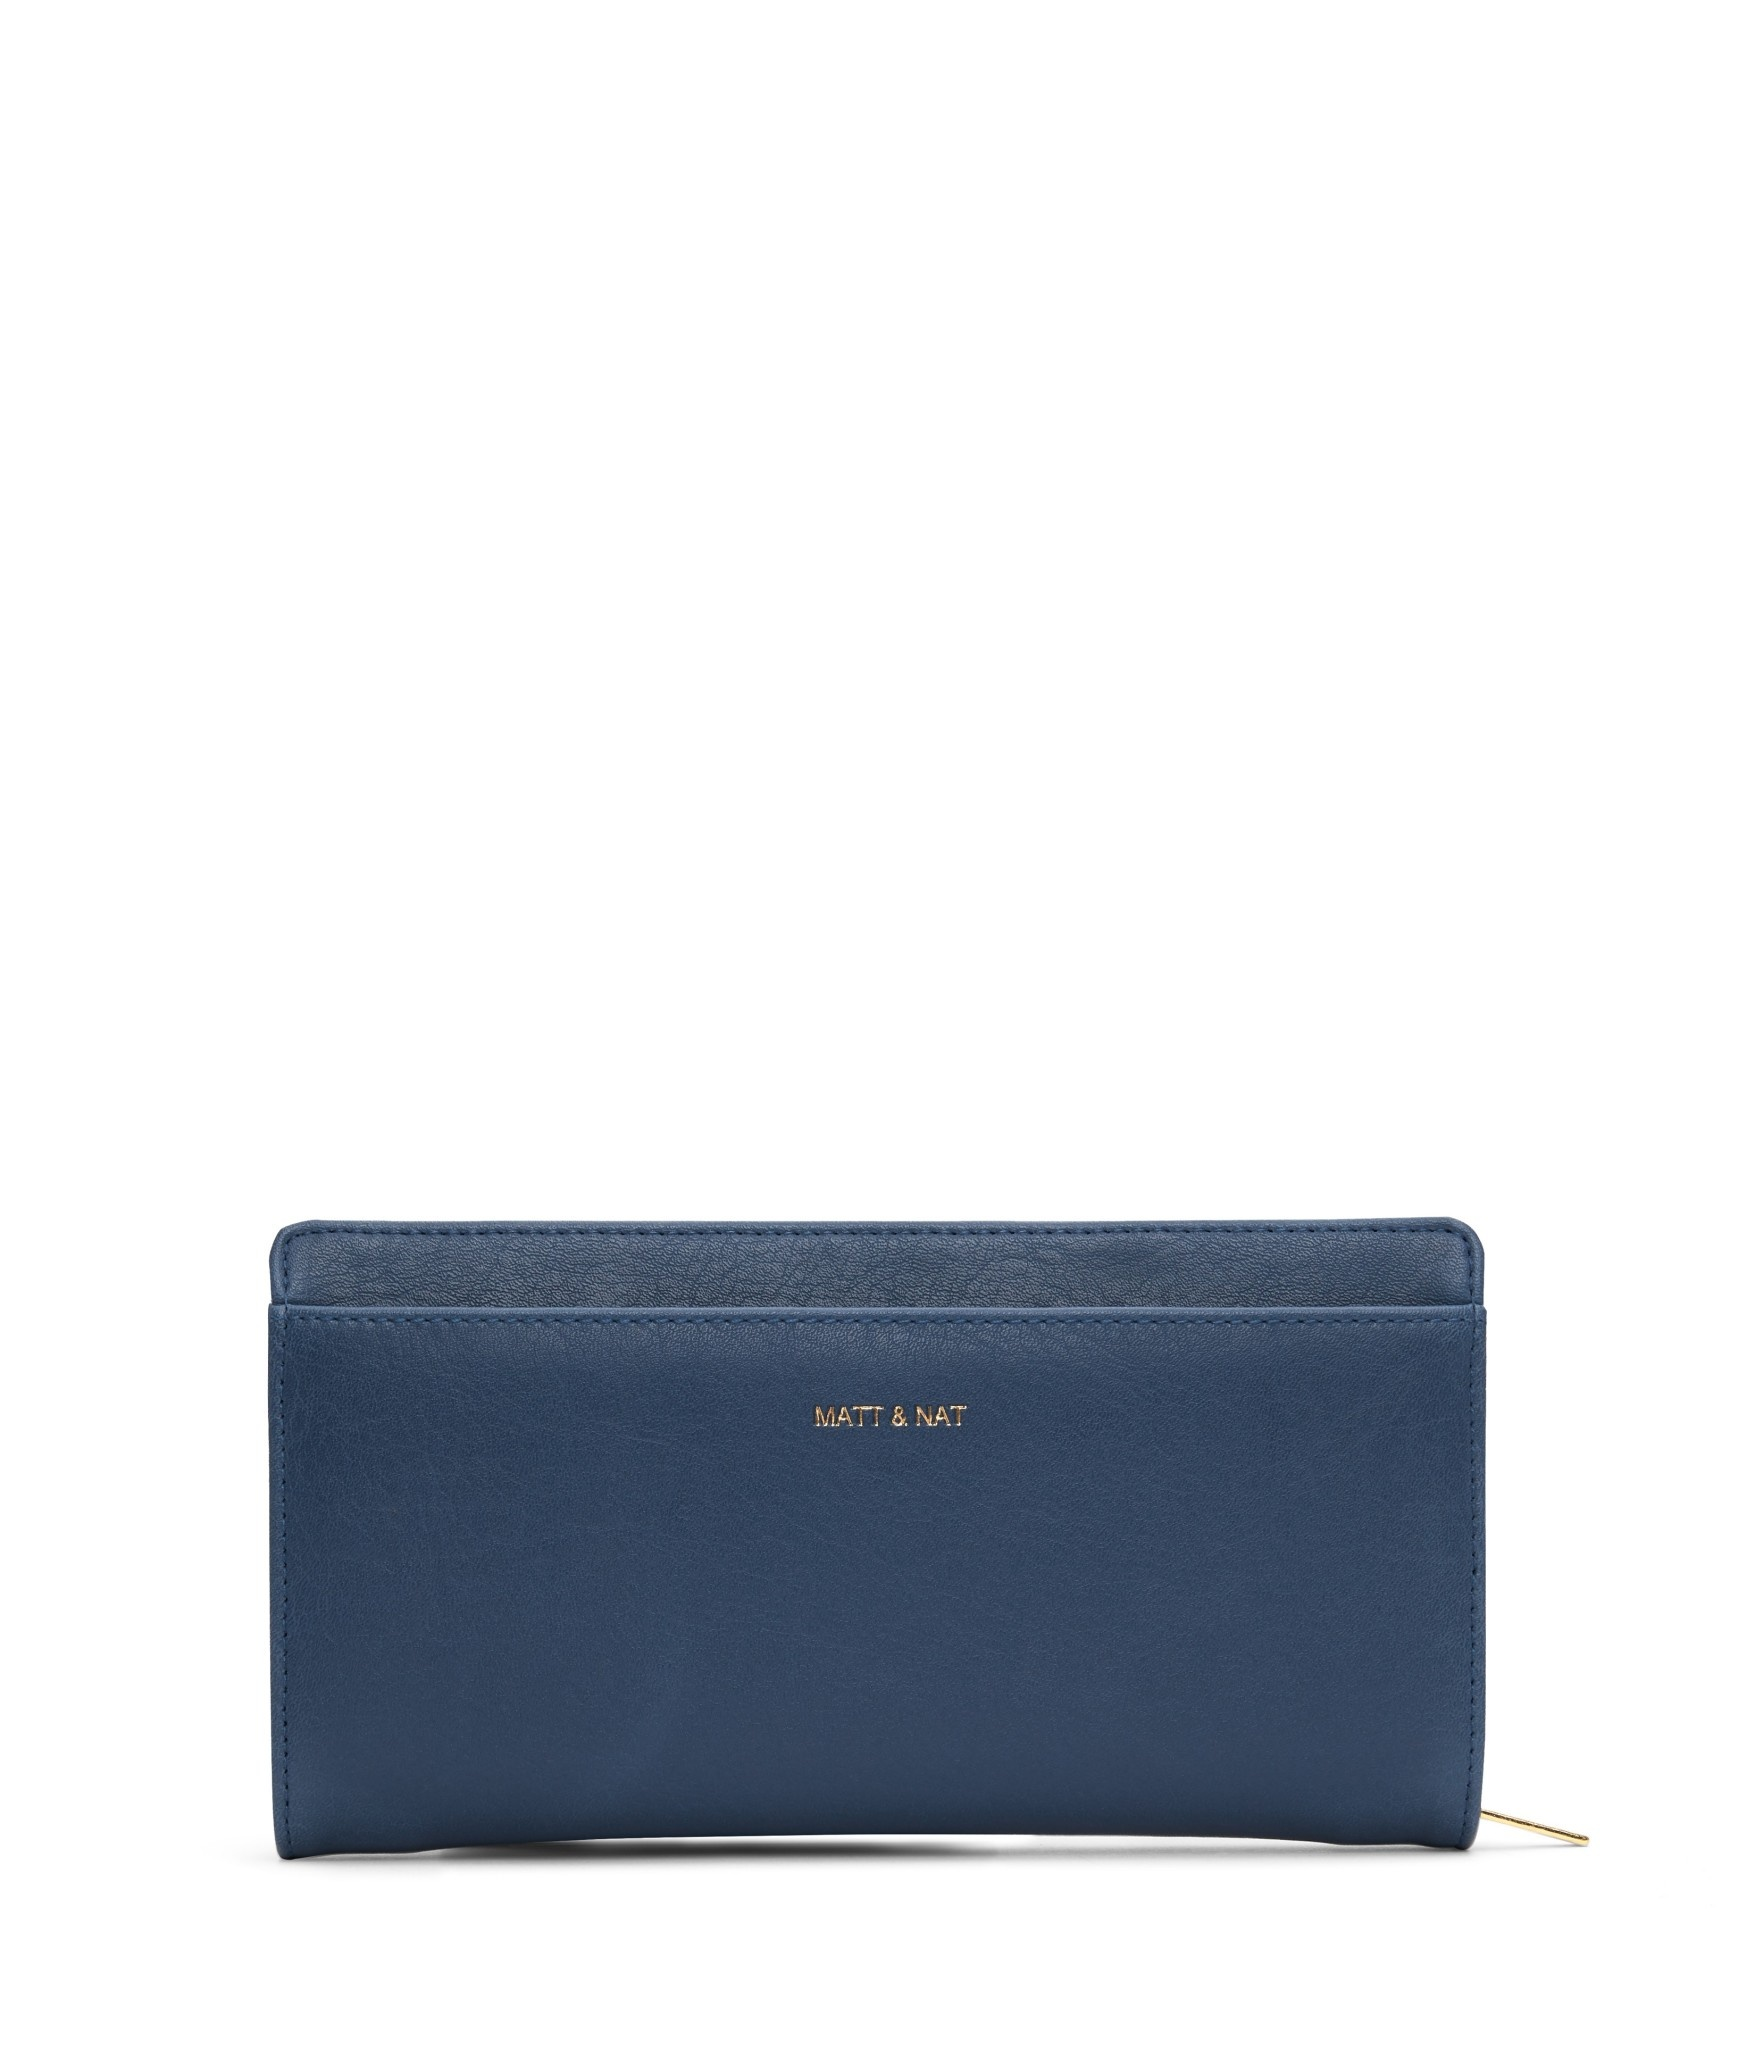 Webber Vintage Wallet Cosmo Blue-1